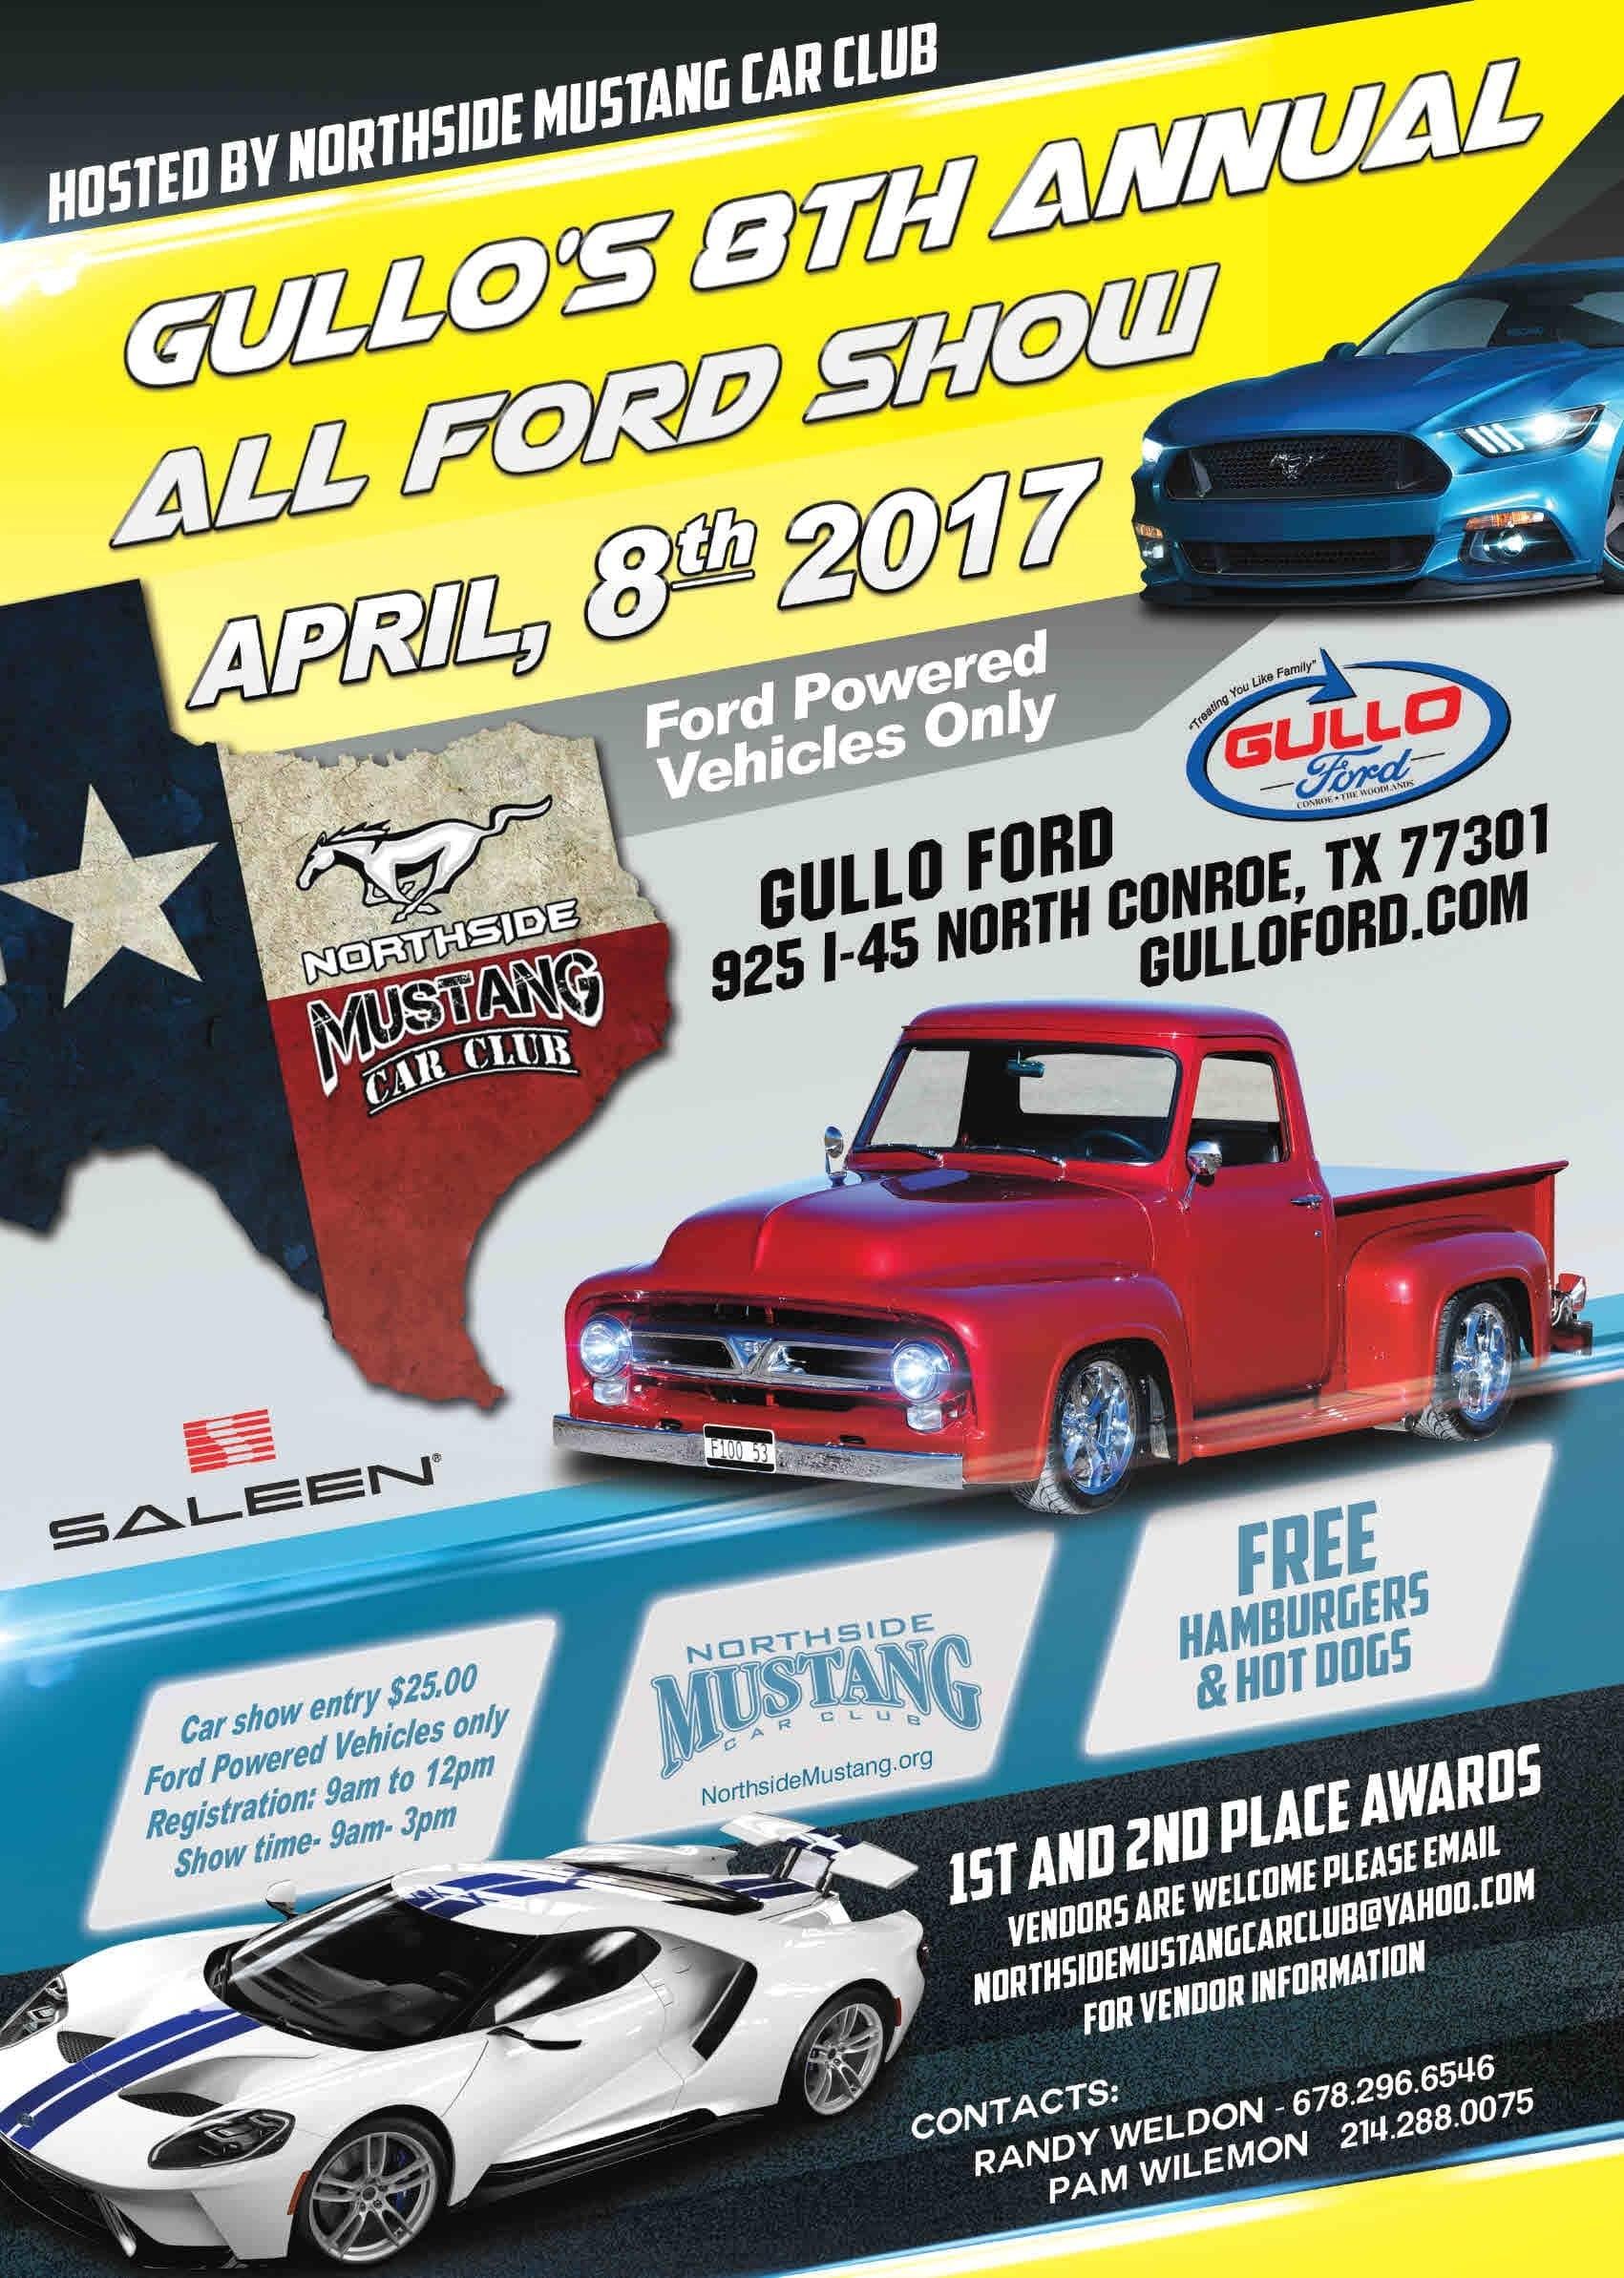 Gullo S 8th Annual All Ford Car Show Gullo Ford Of Conroe